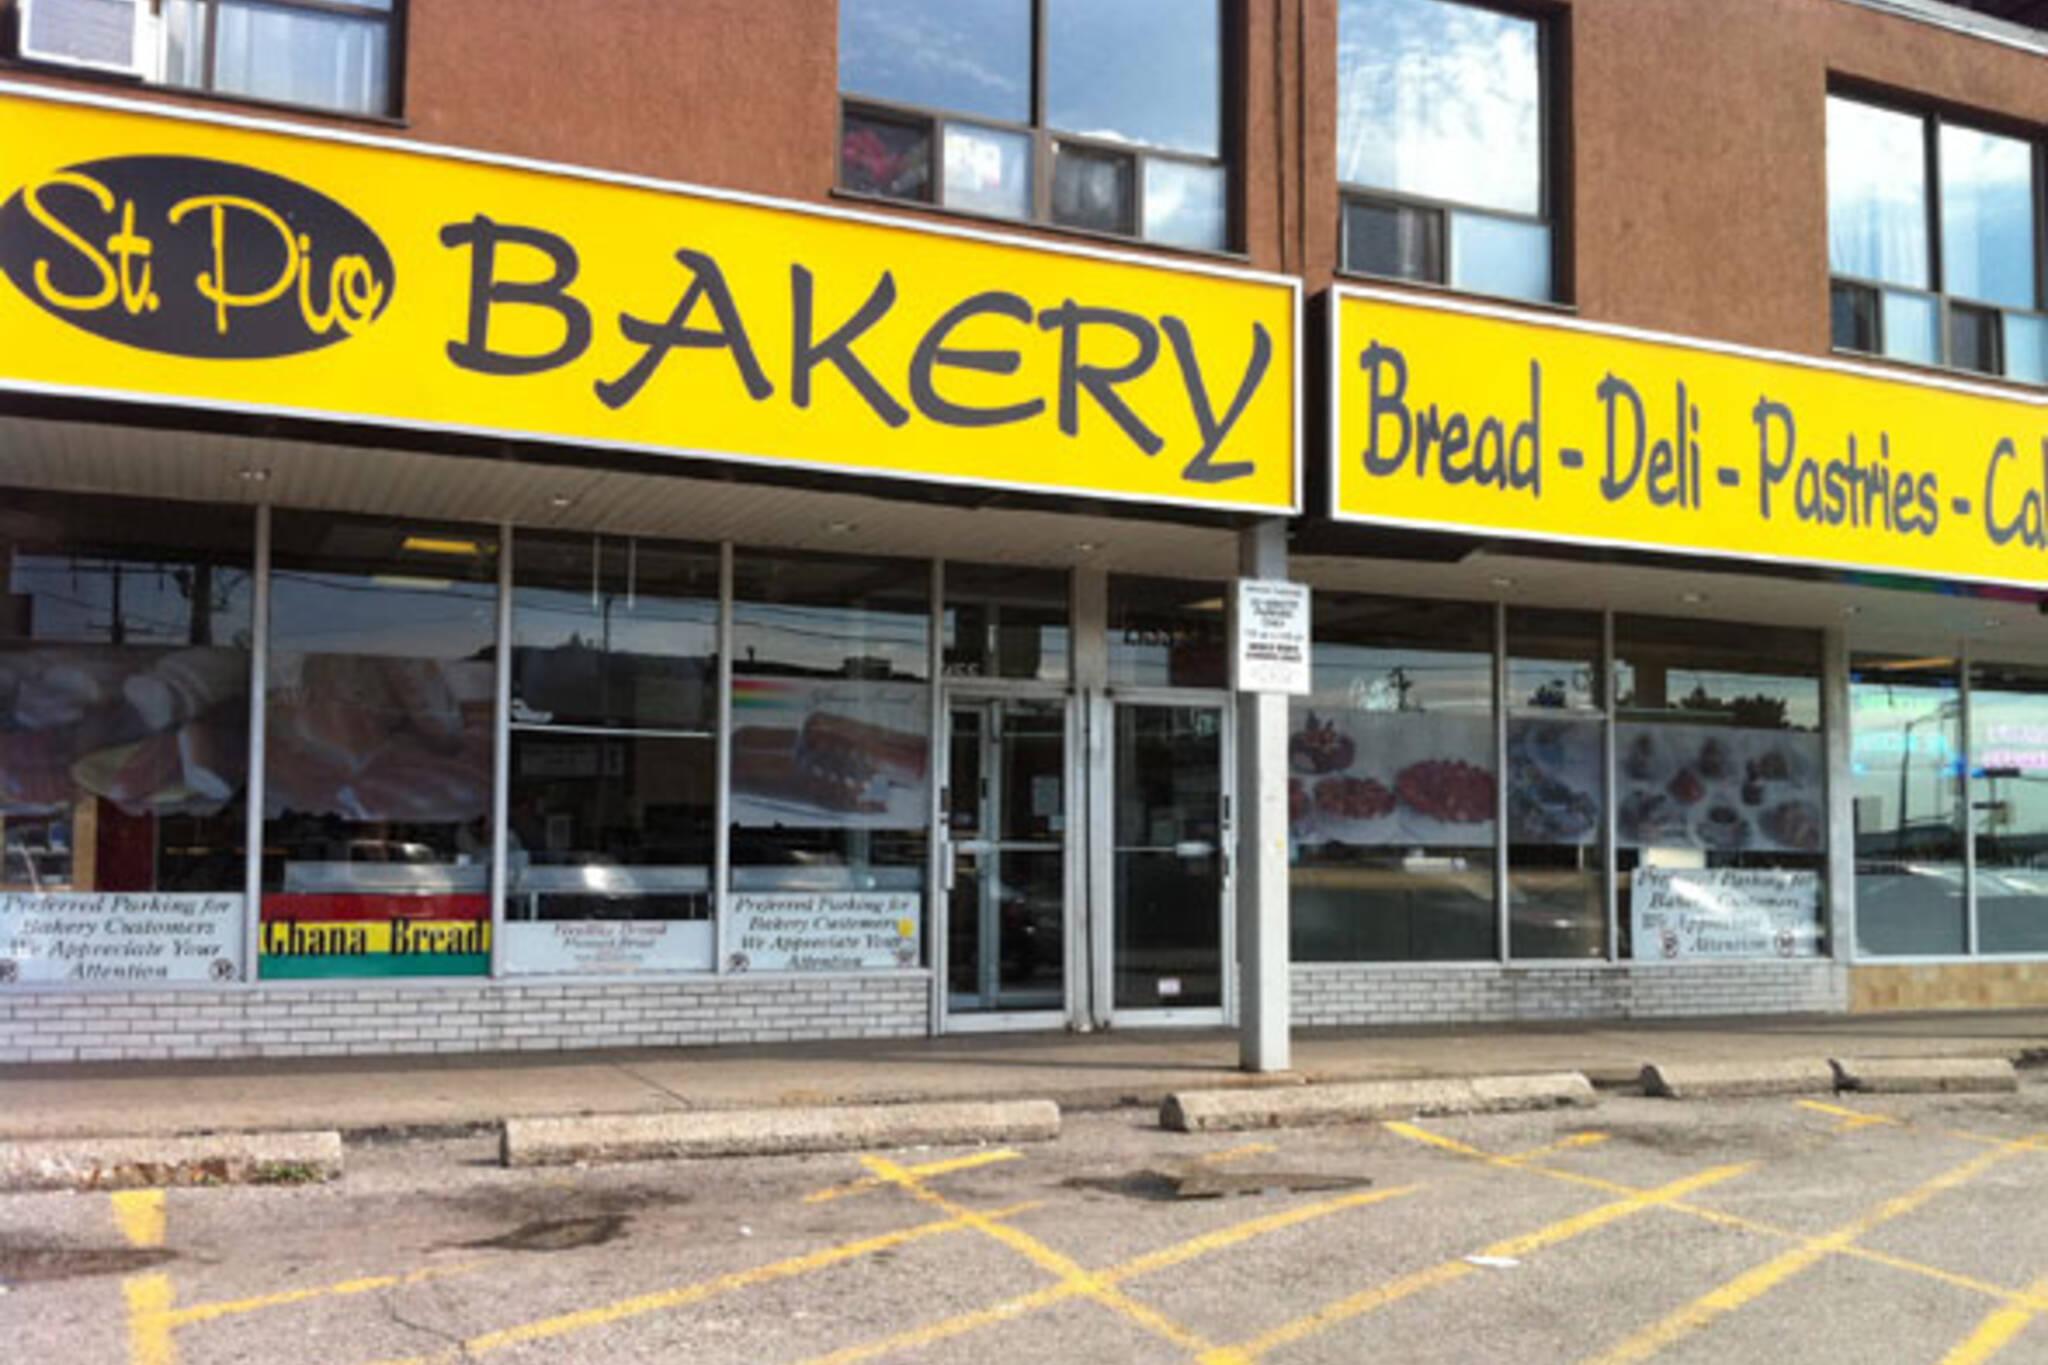 St. Pio Bakery Toronto